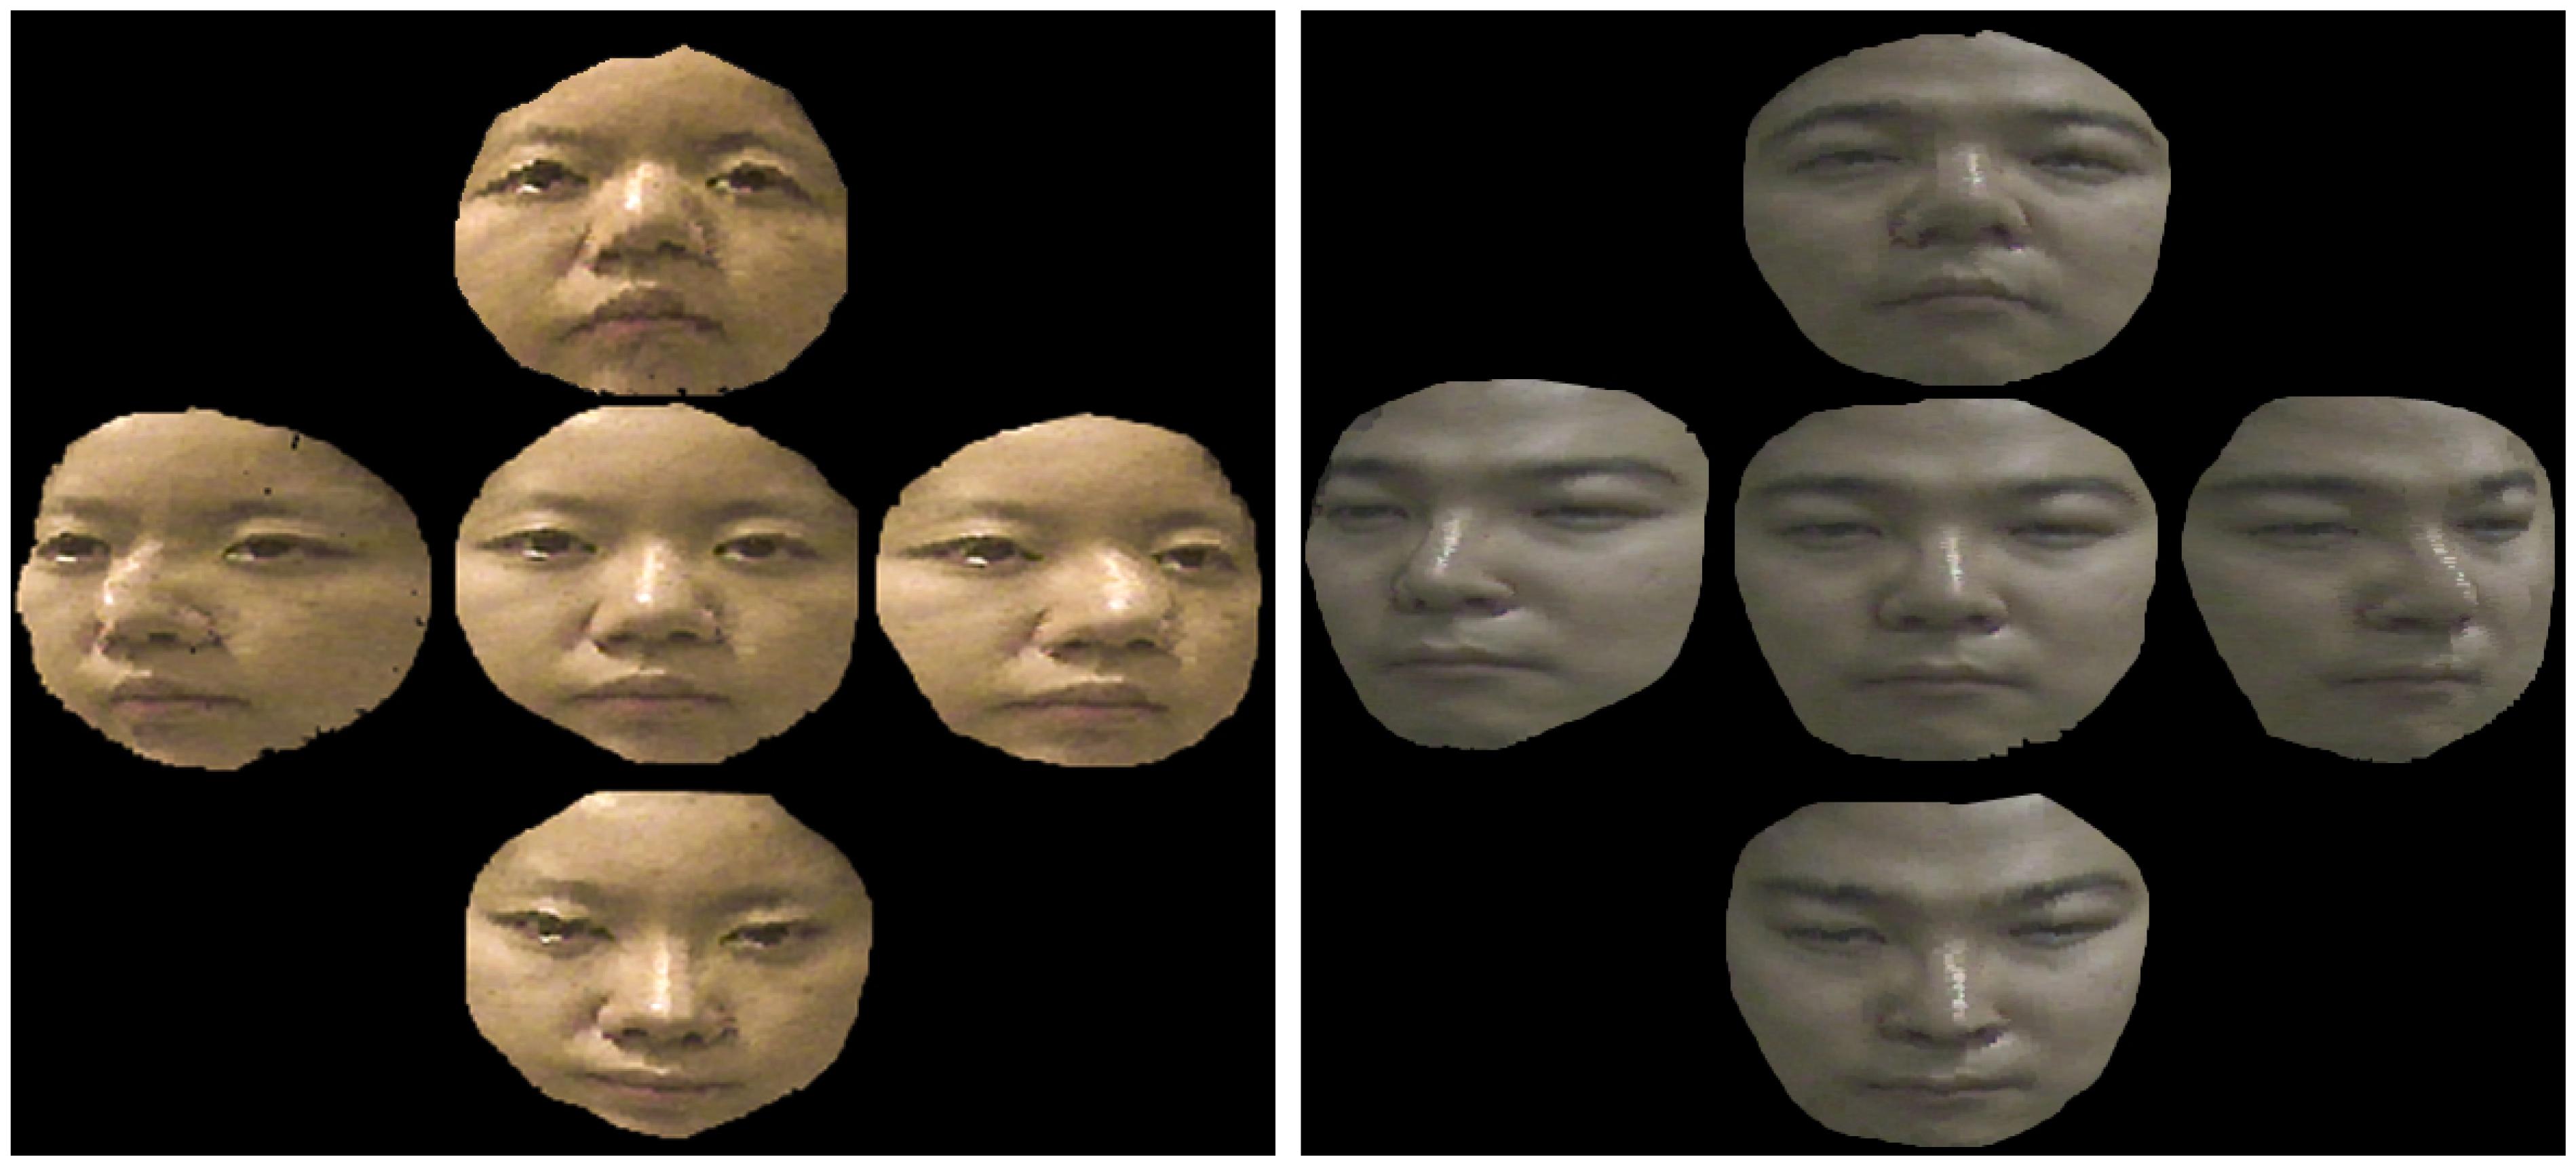 Sensors | Free Full-Text | Random-Profiles-Based 3D Face Recognition